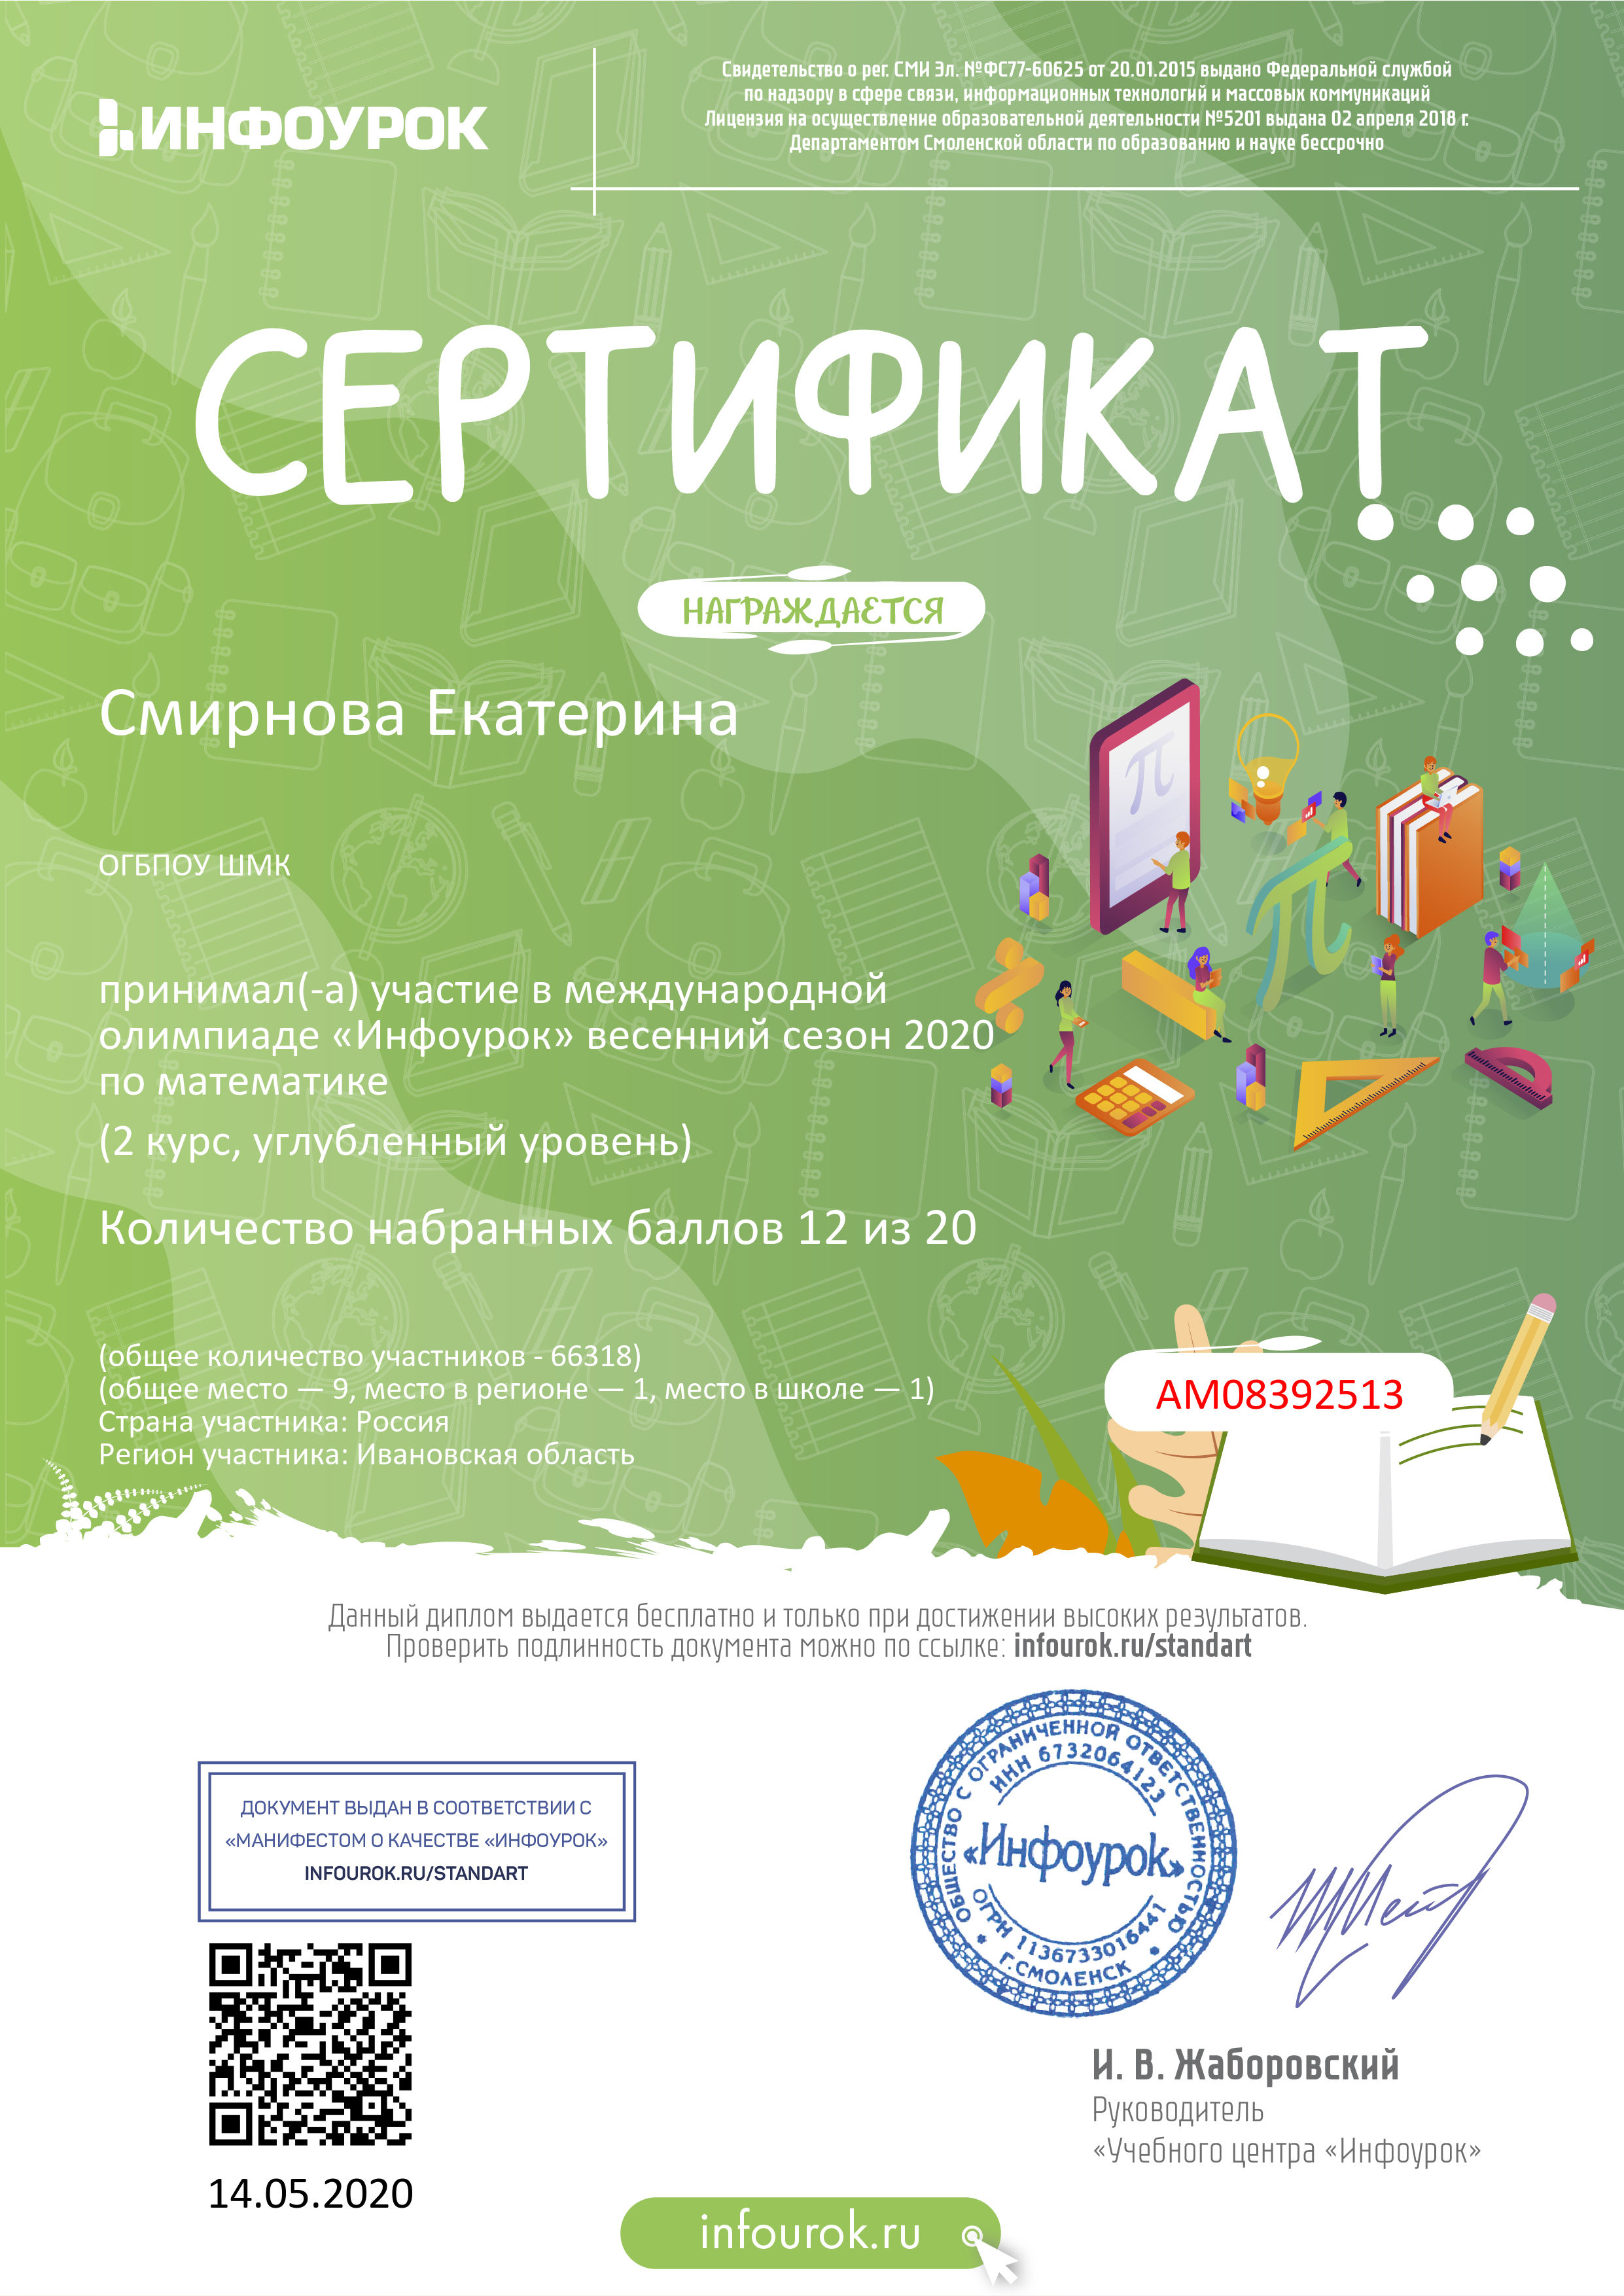 Сертификат проекта infourok.ru №АМ08392513